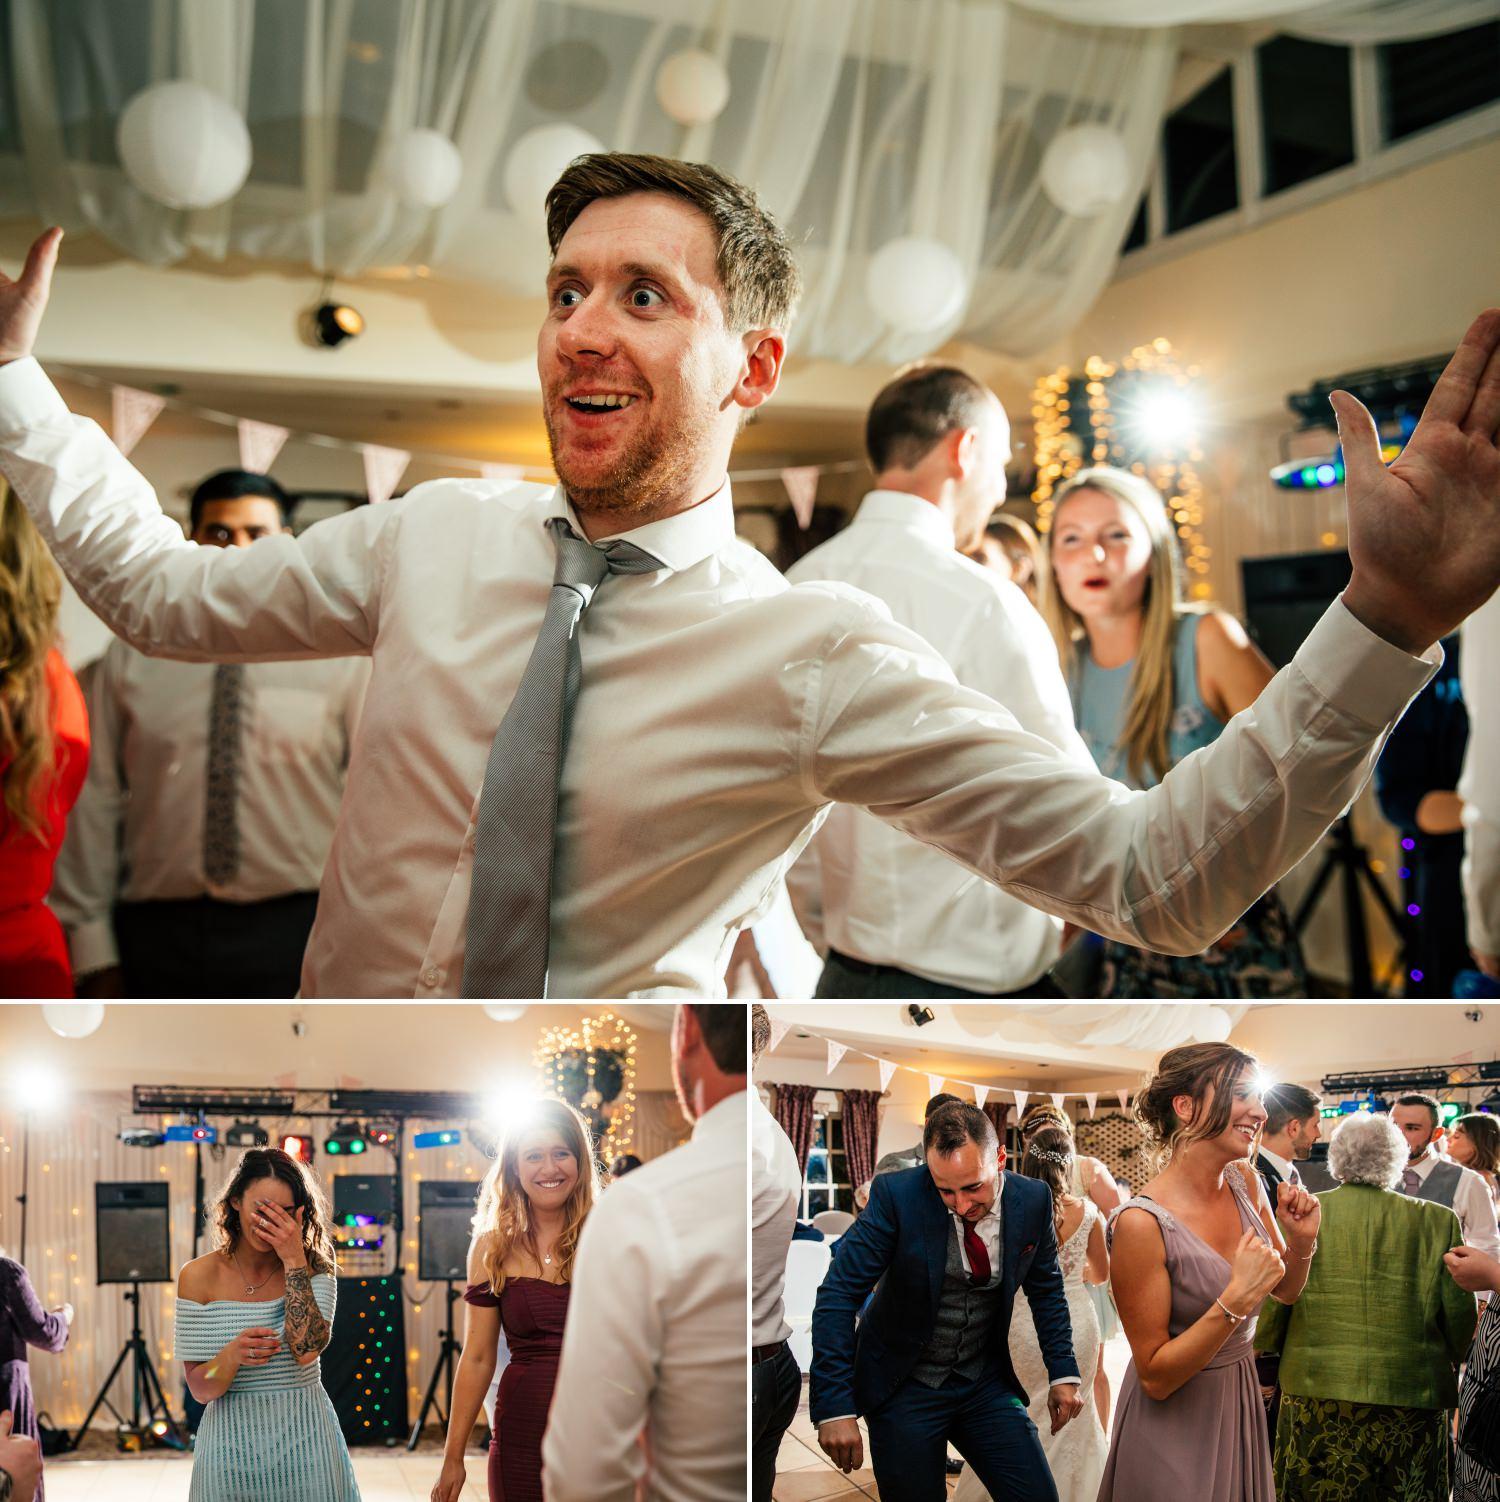 Dancing at Plas Hafod Wedding